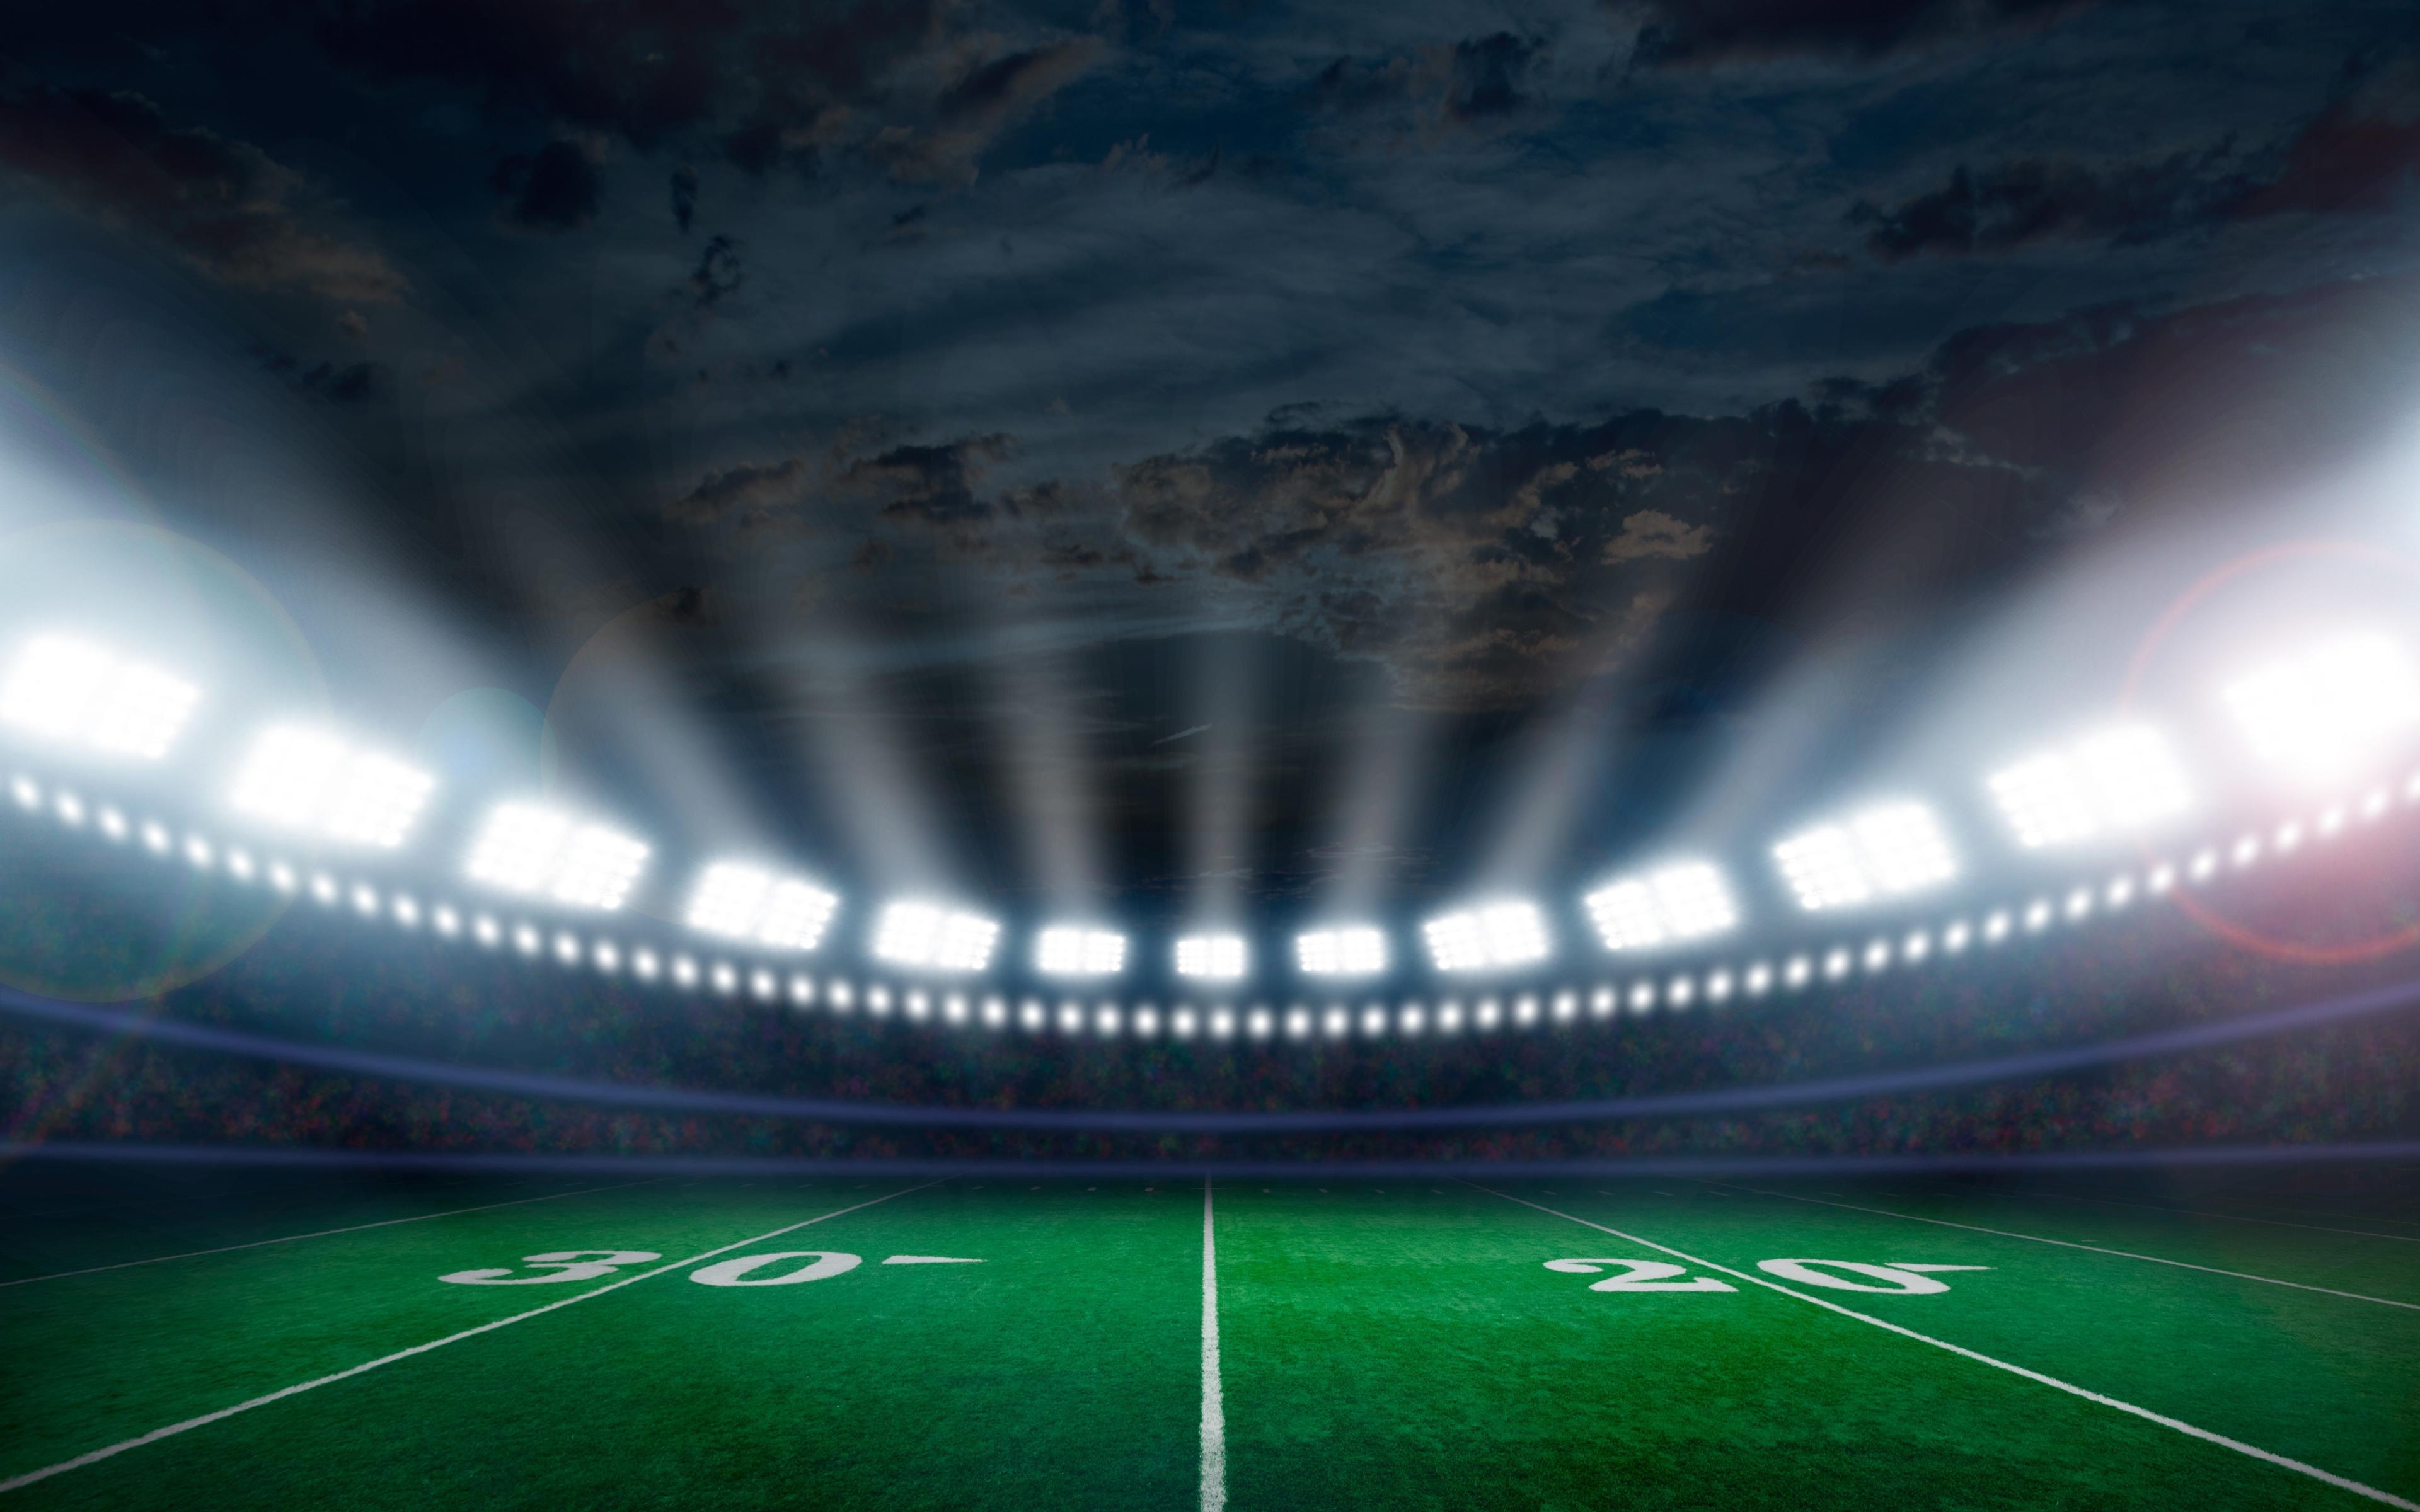 Download 3840x2400 Wallpaper Stadium, Football, Lights